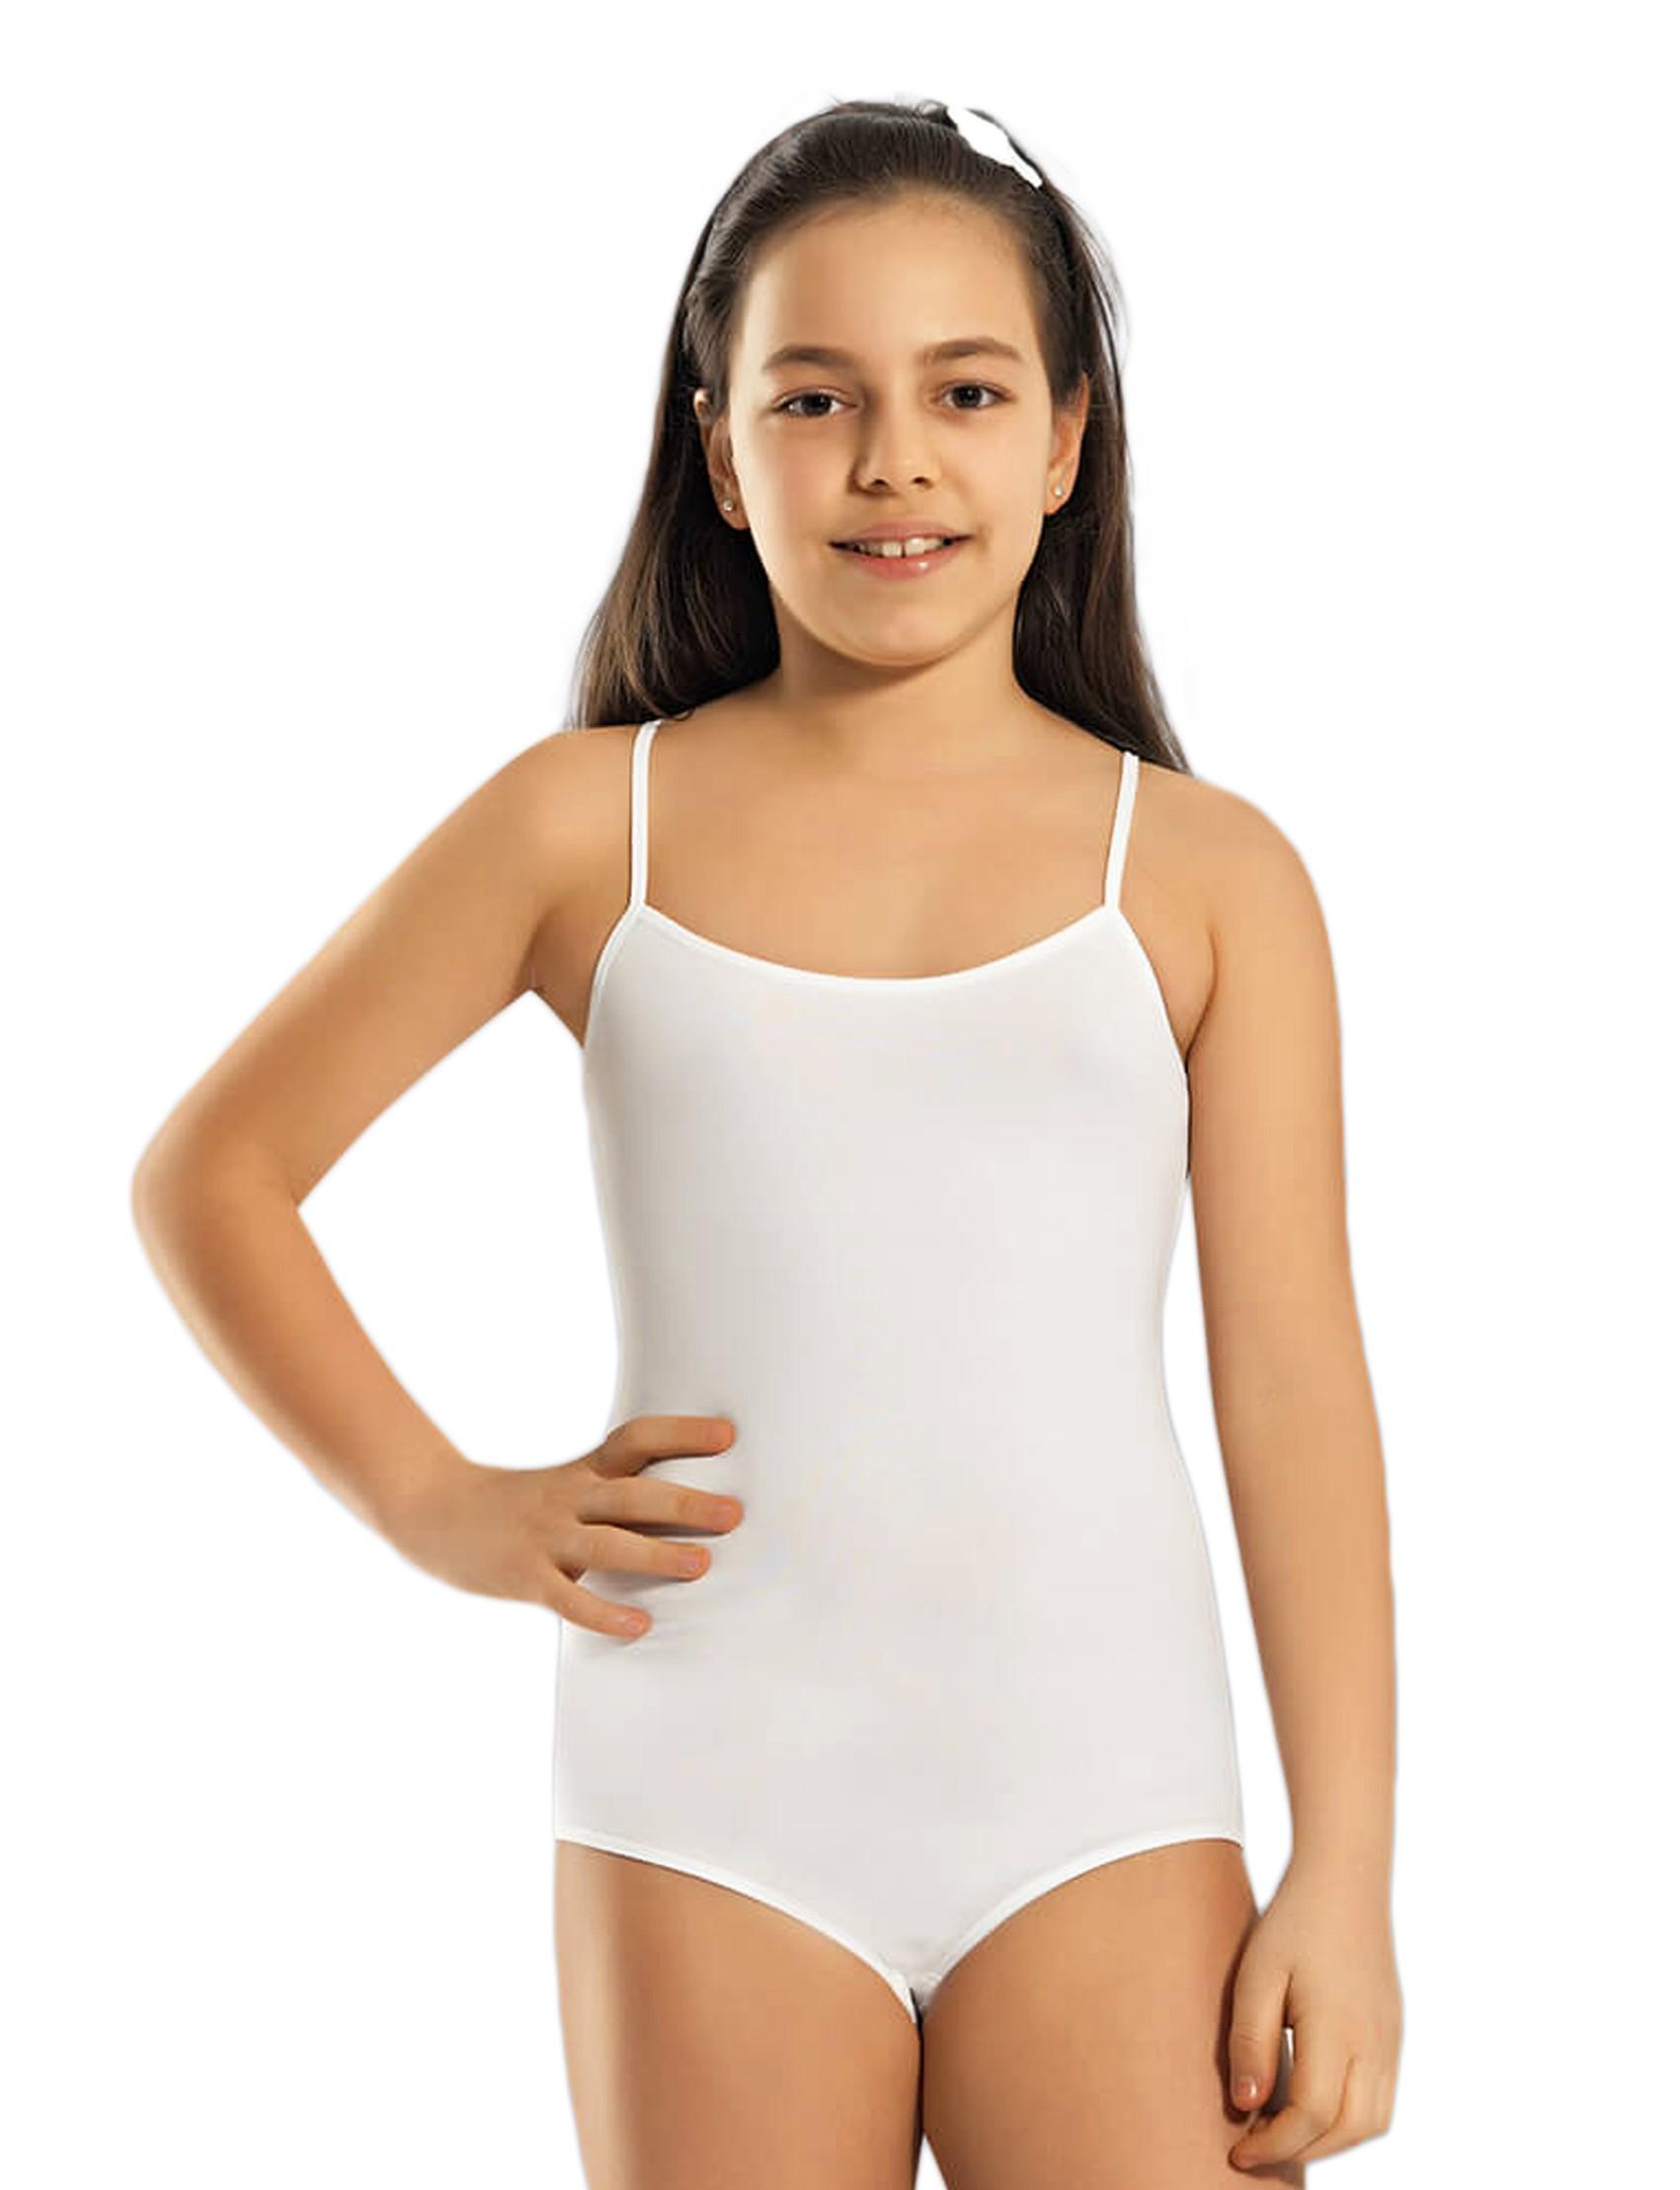 4be97d253f5 Βαμβακερό Κορμάκι με λεπτή τιραντα για κορίτσια 4 έως 12 ετών-461